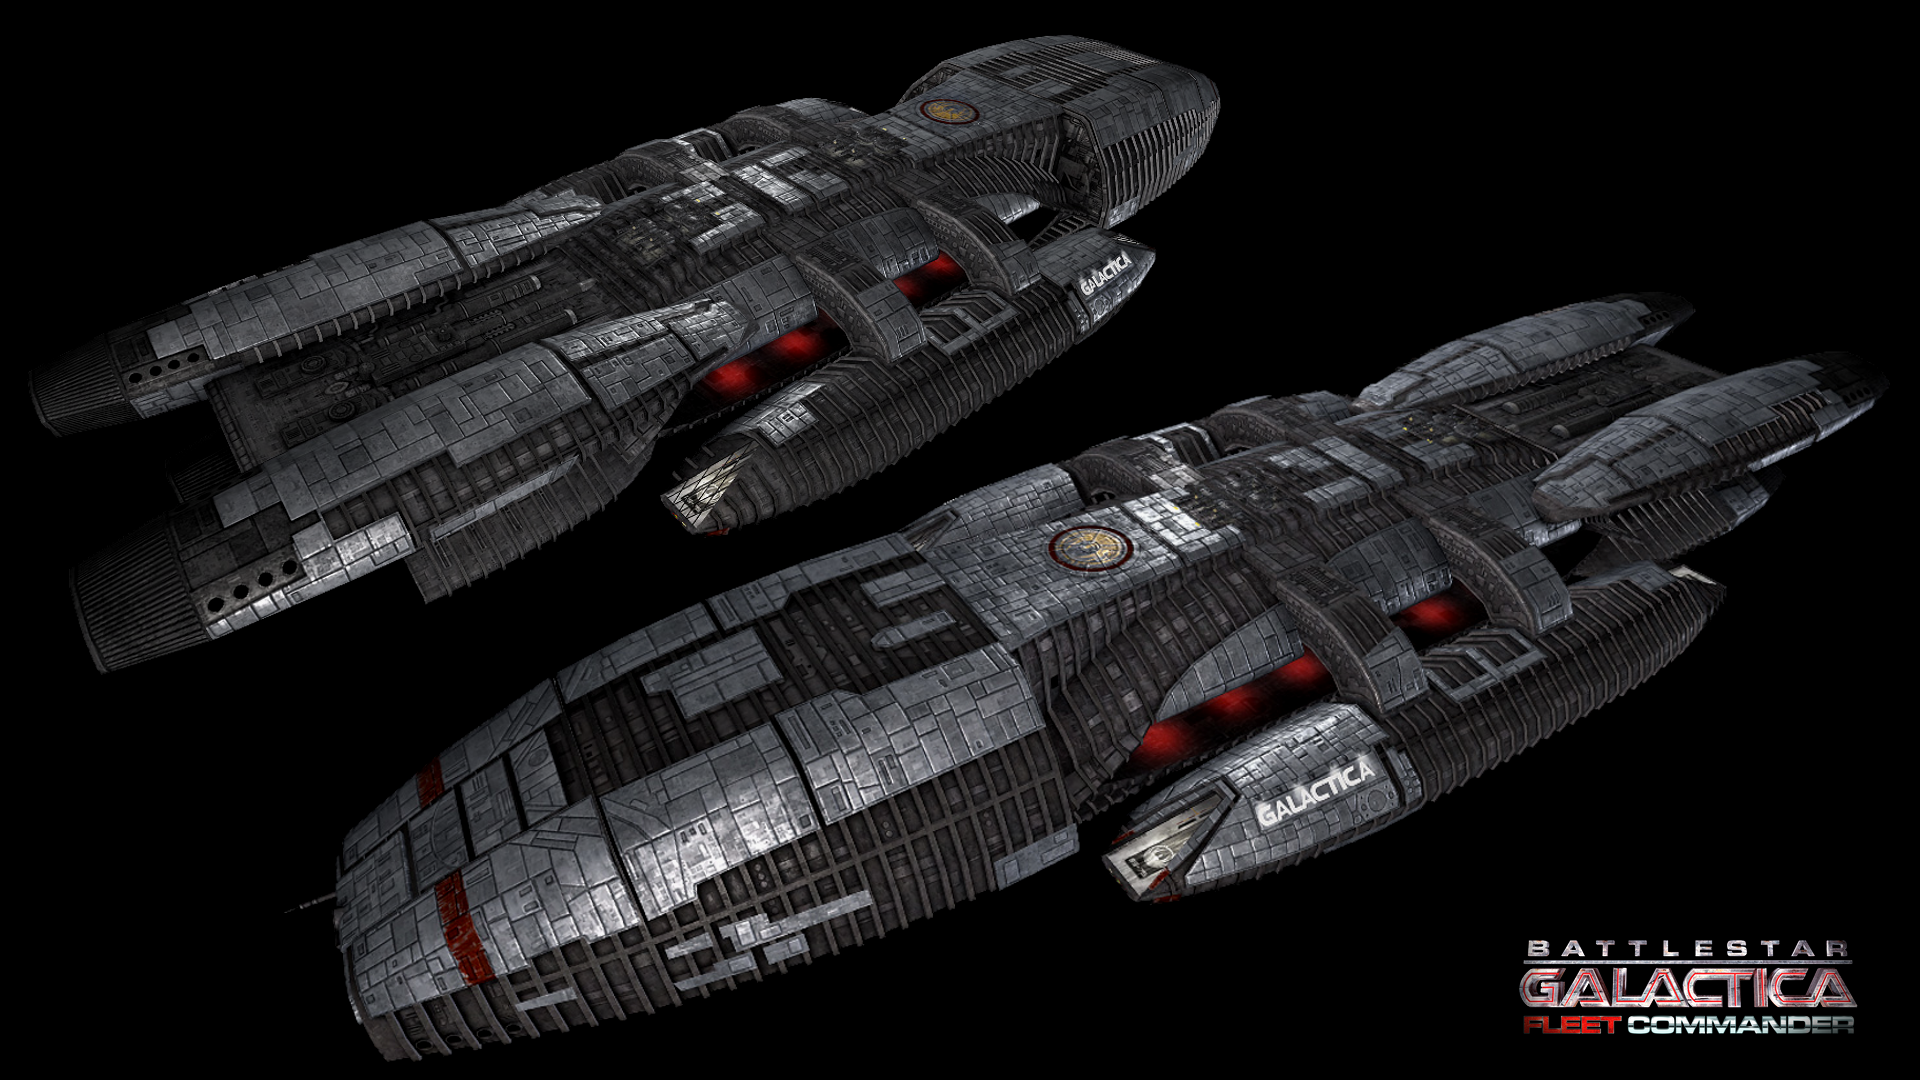 Battlestar Galactica Blog